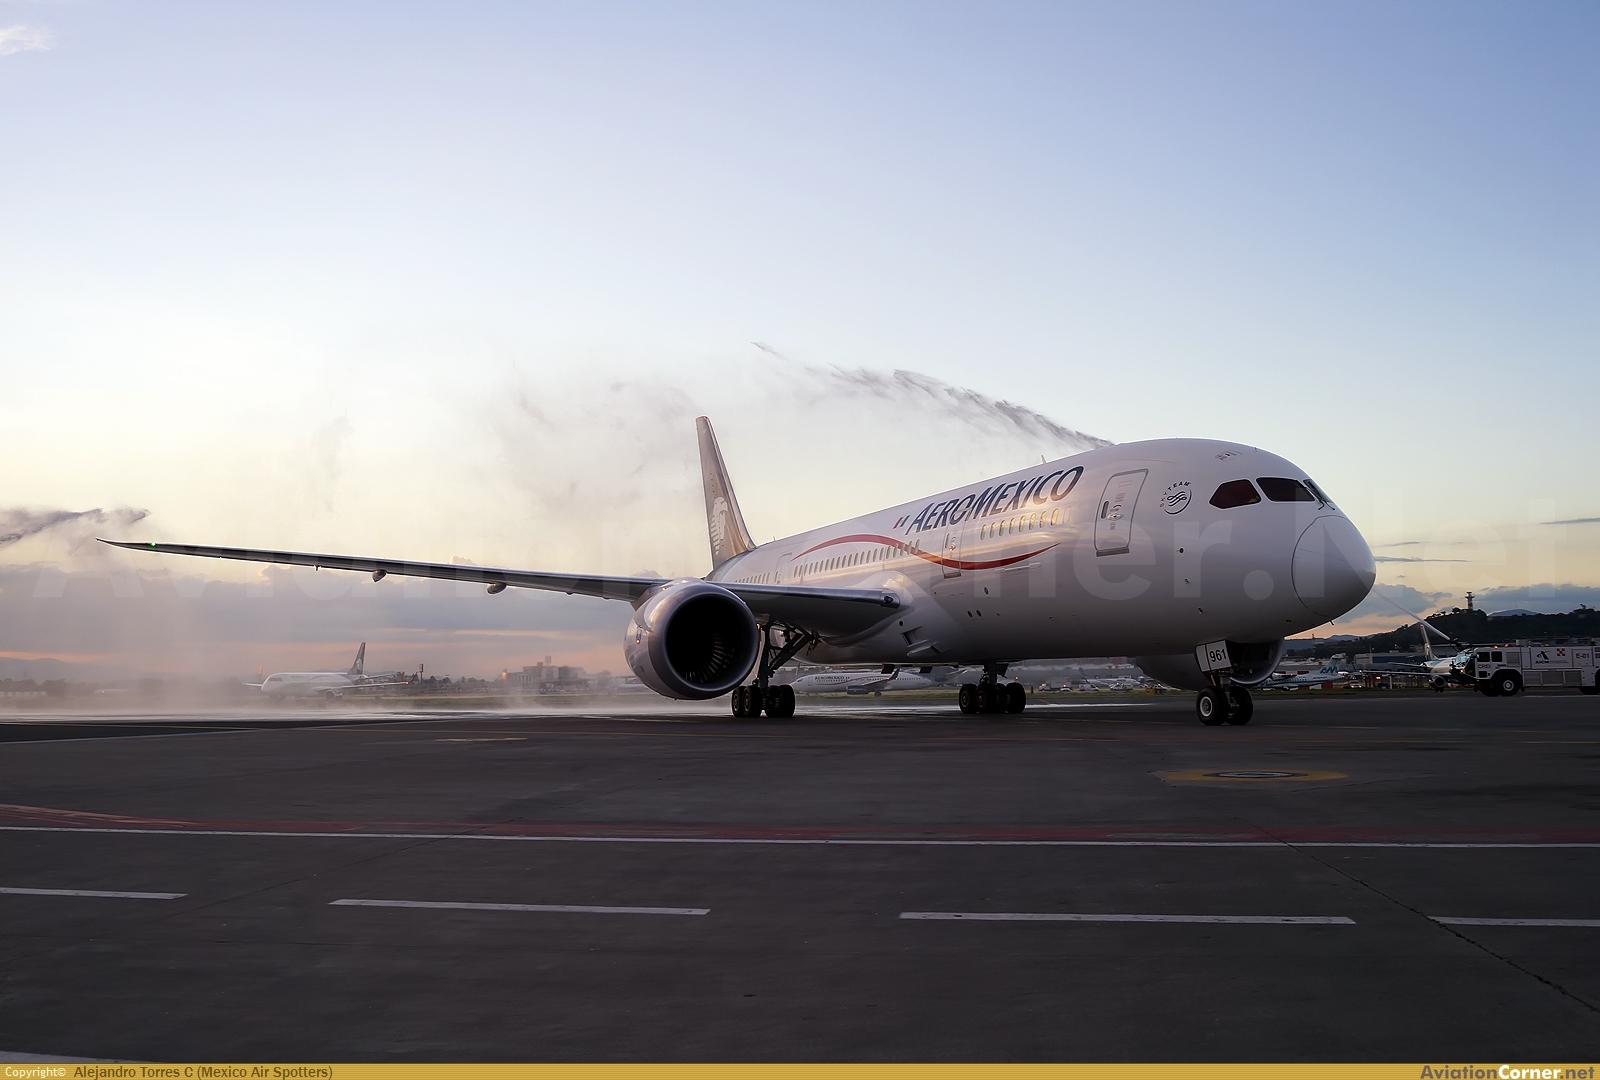 Boeing 787-8 de Aeroméxico - Página 2 Avc_00316203